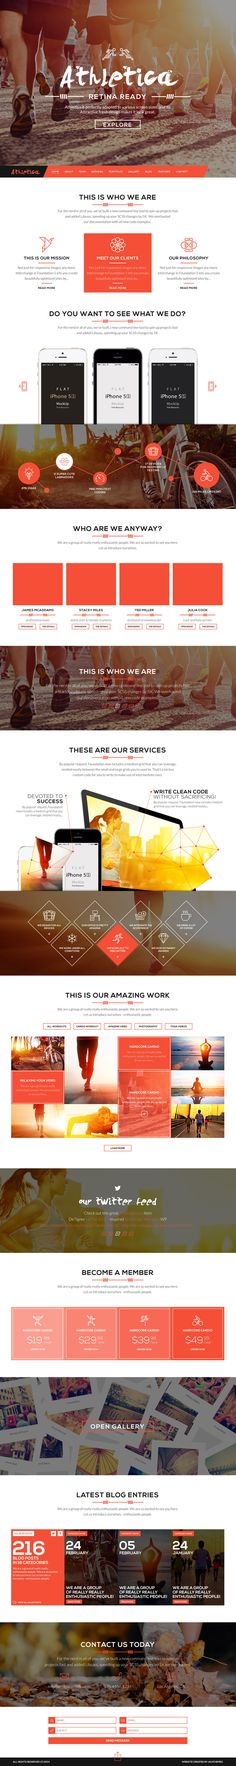 Athletica - Retina Parallax OnePage WP Shop Theme #html5themes